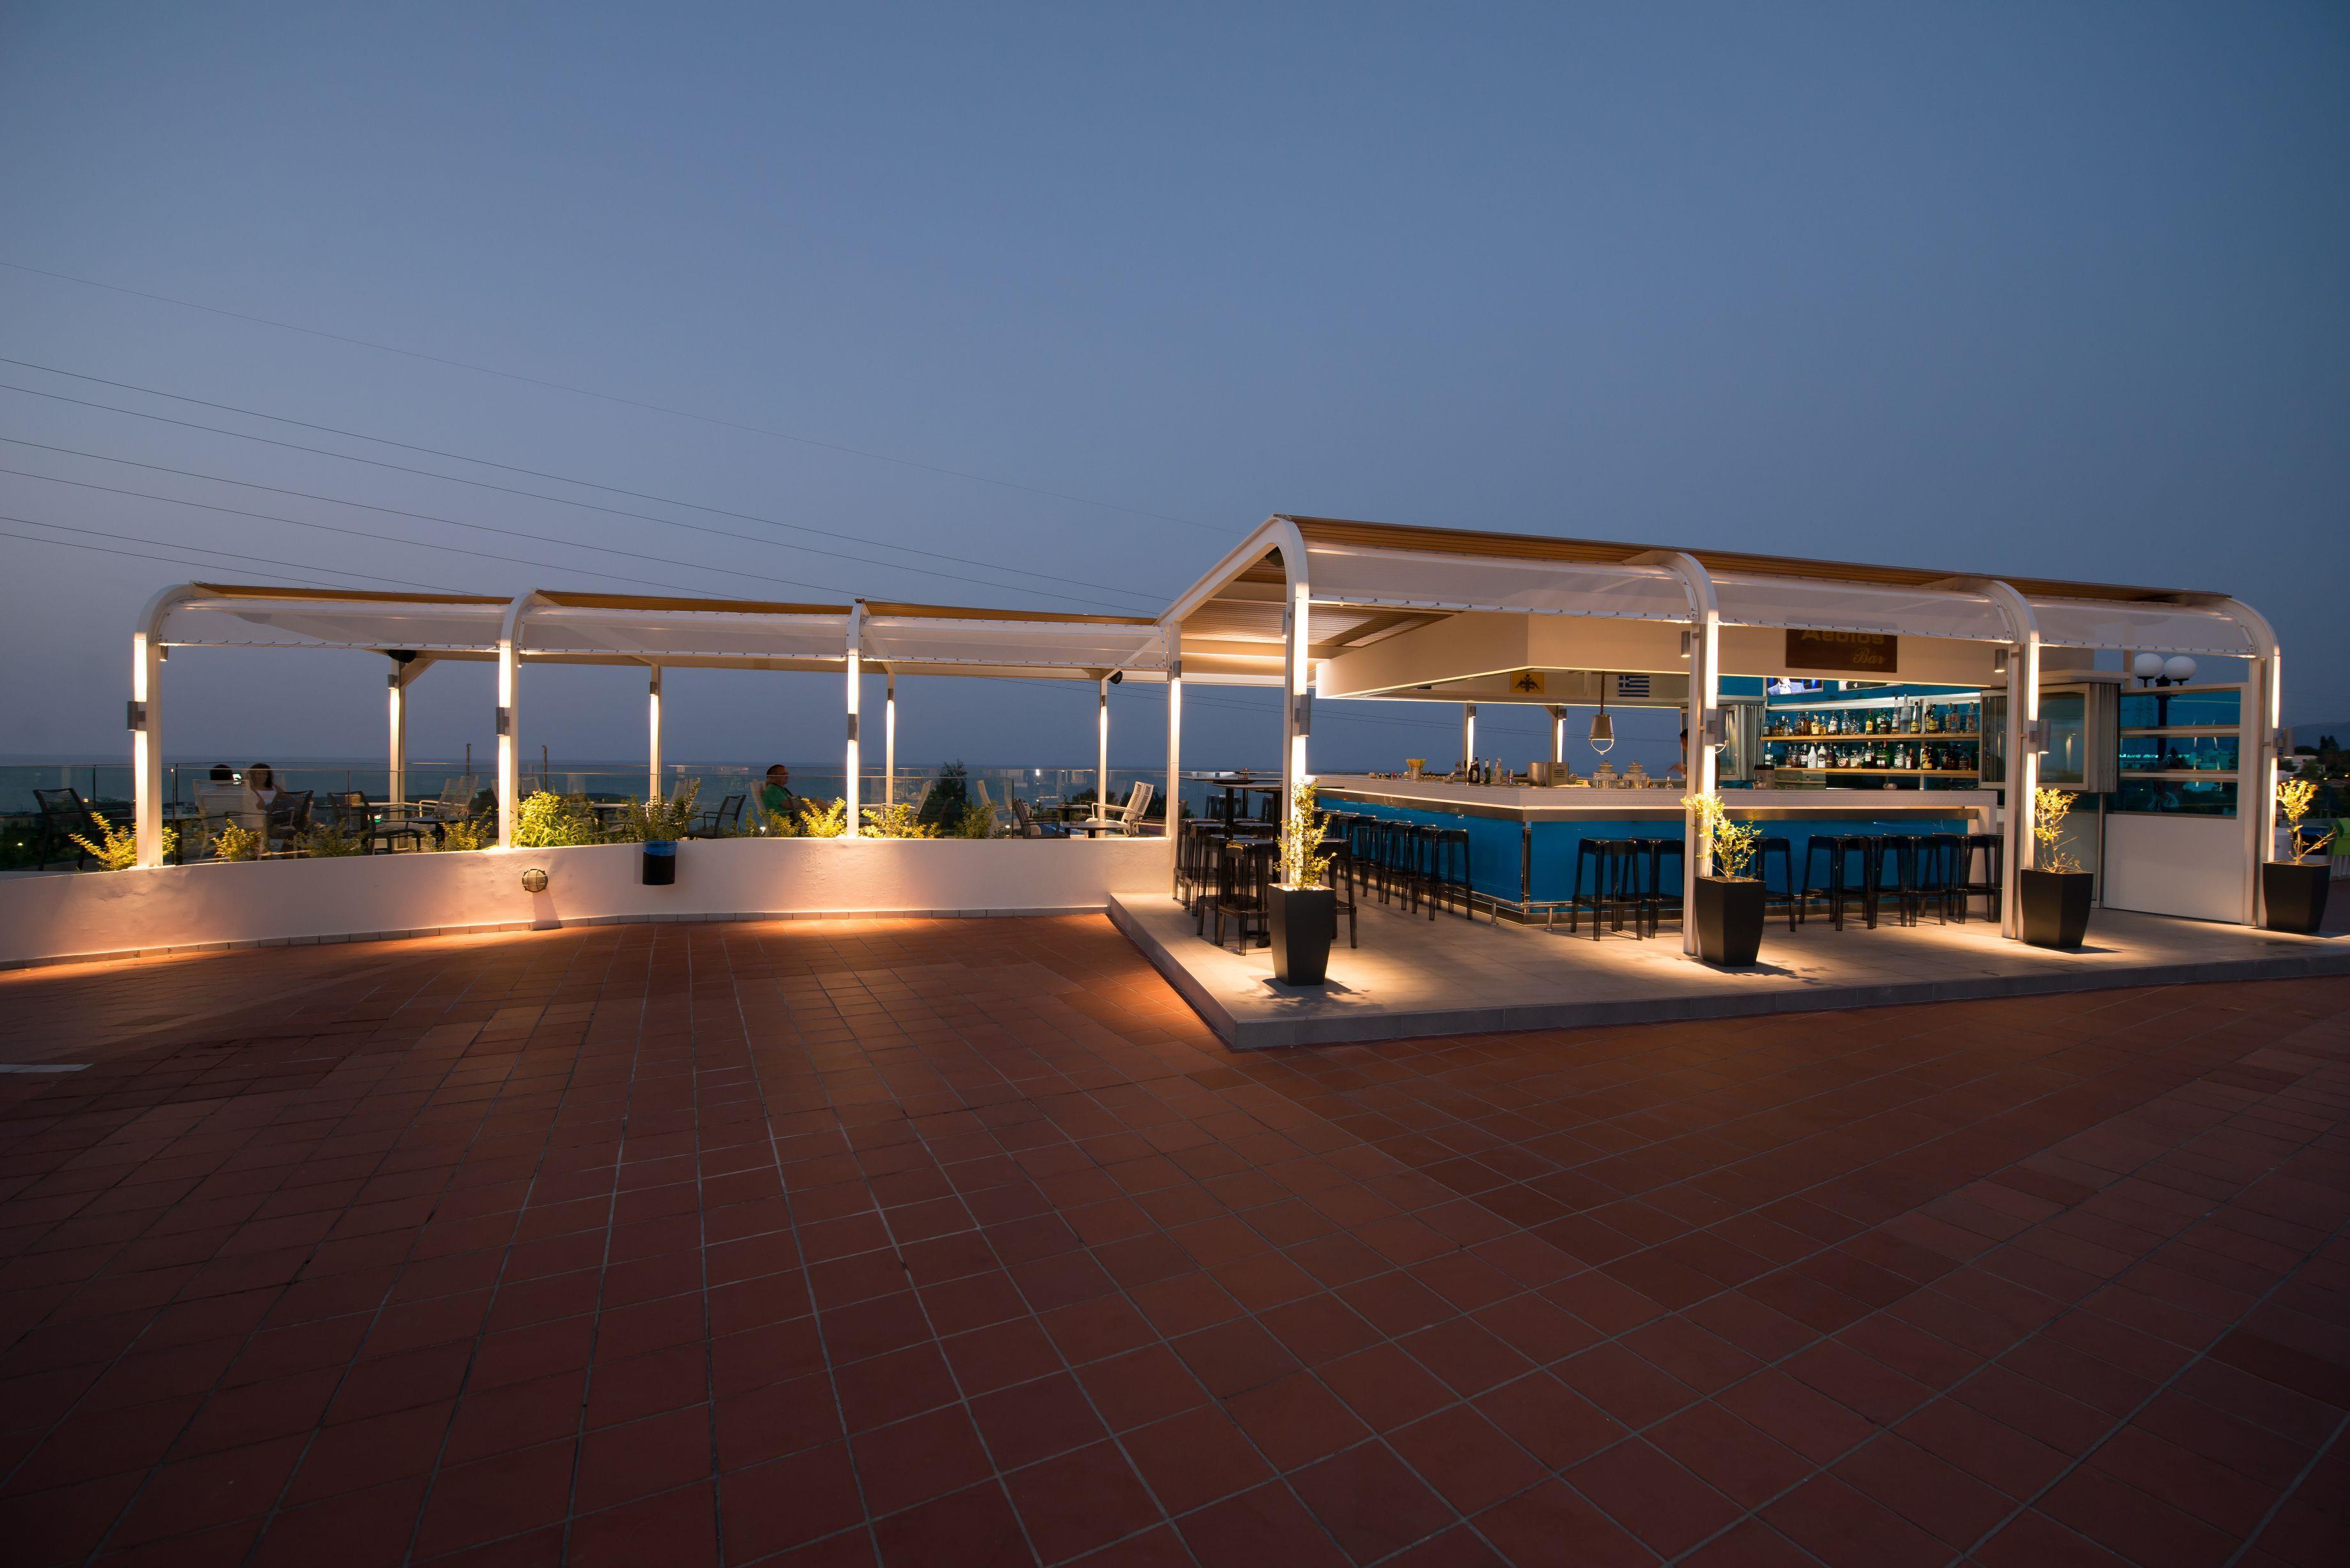 http://www.orextravel.sk/OREX/hotelphotos/royal-belvedere-general-0042.jpg